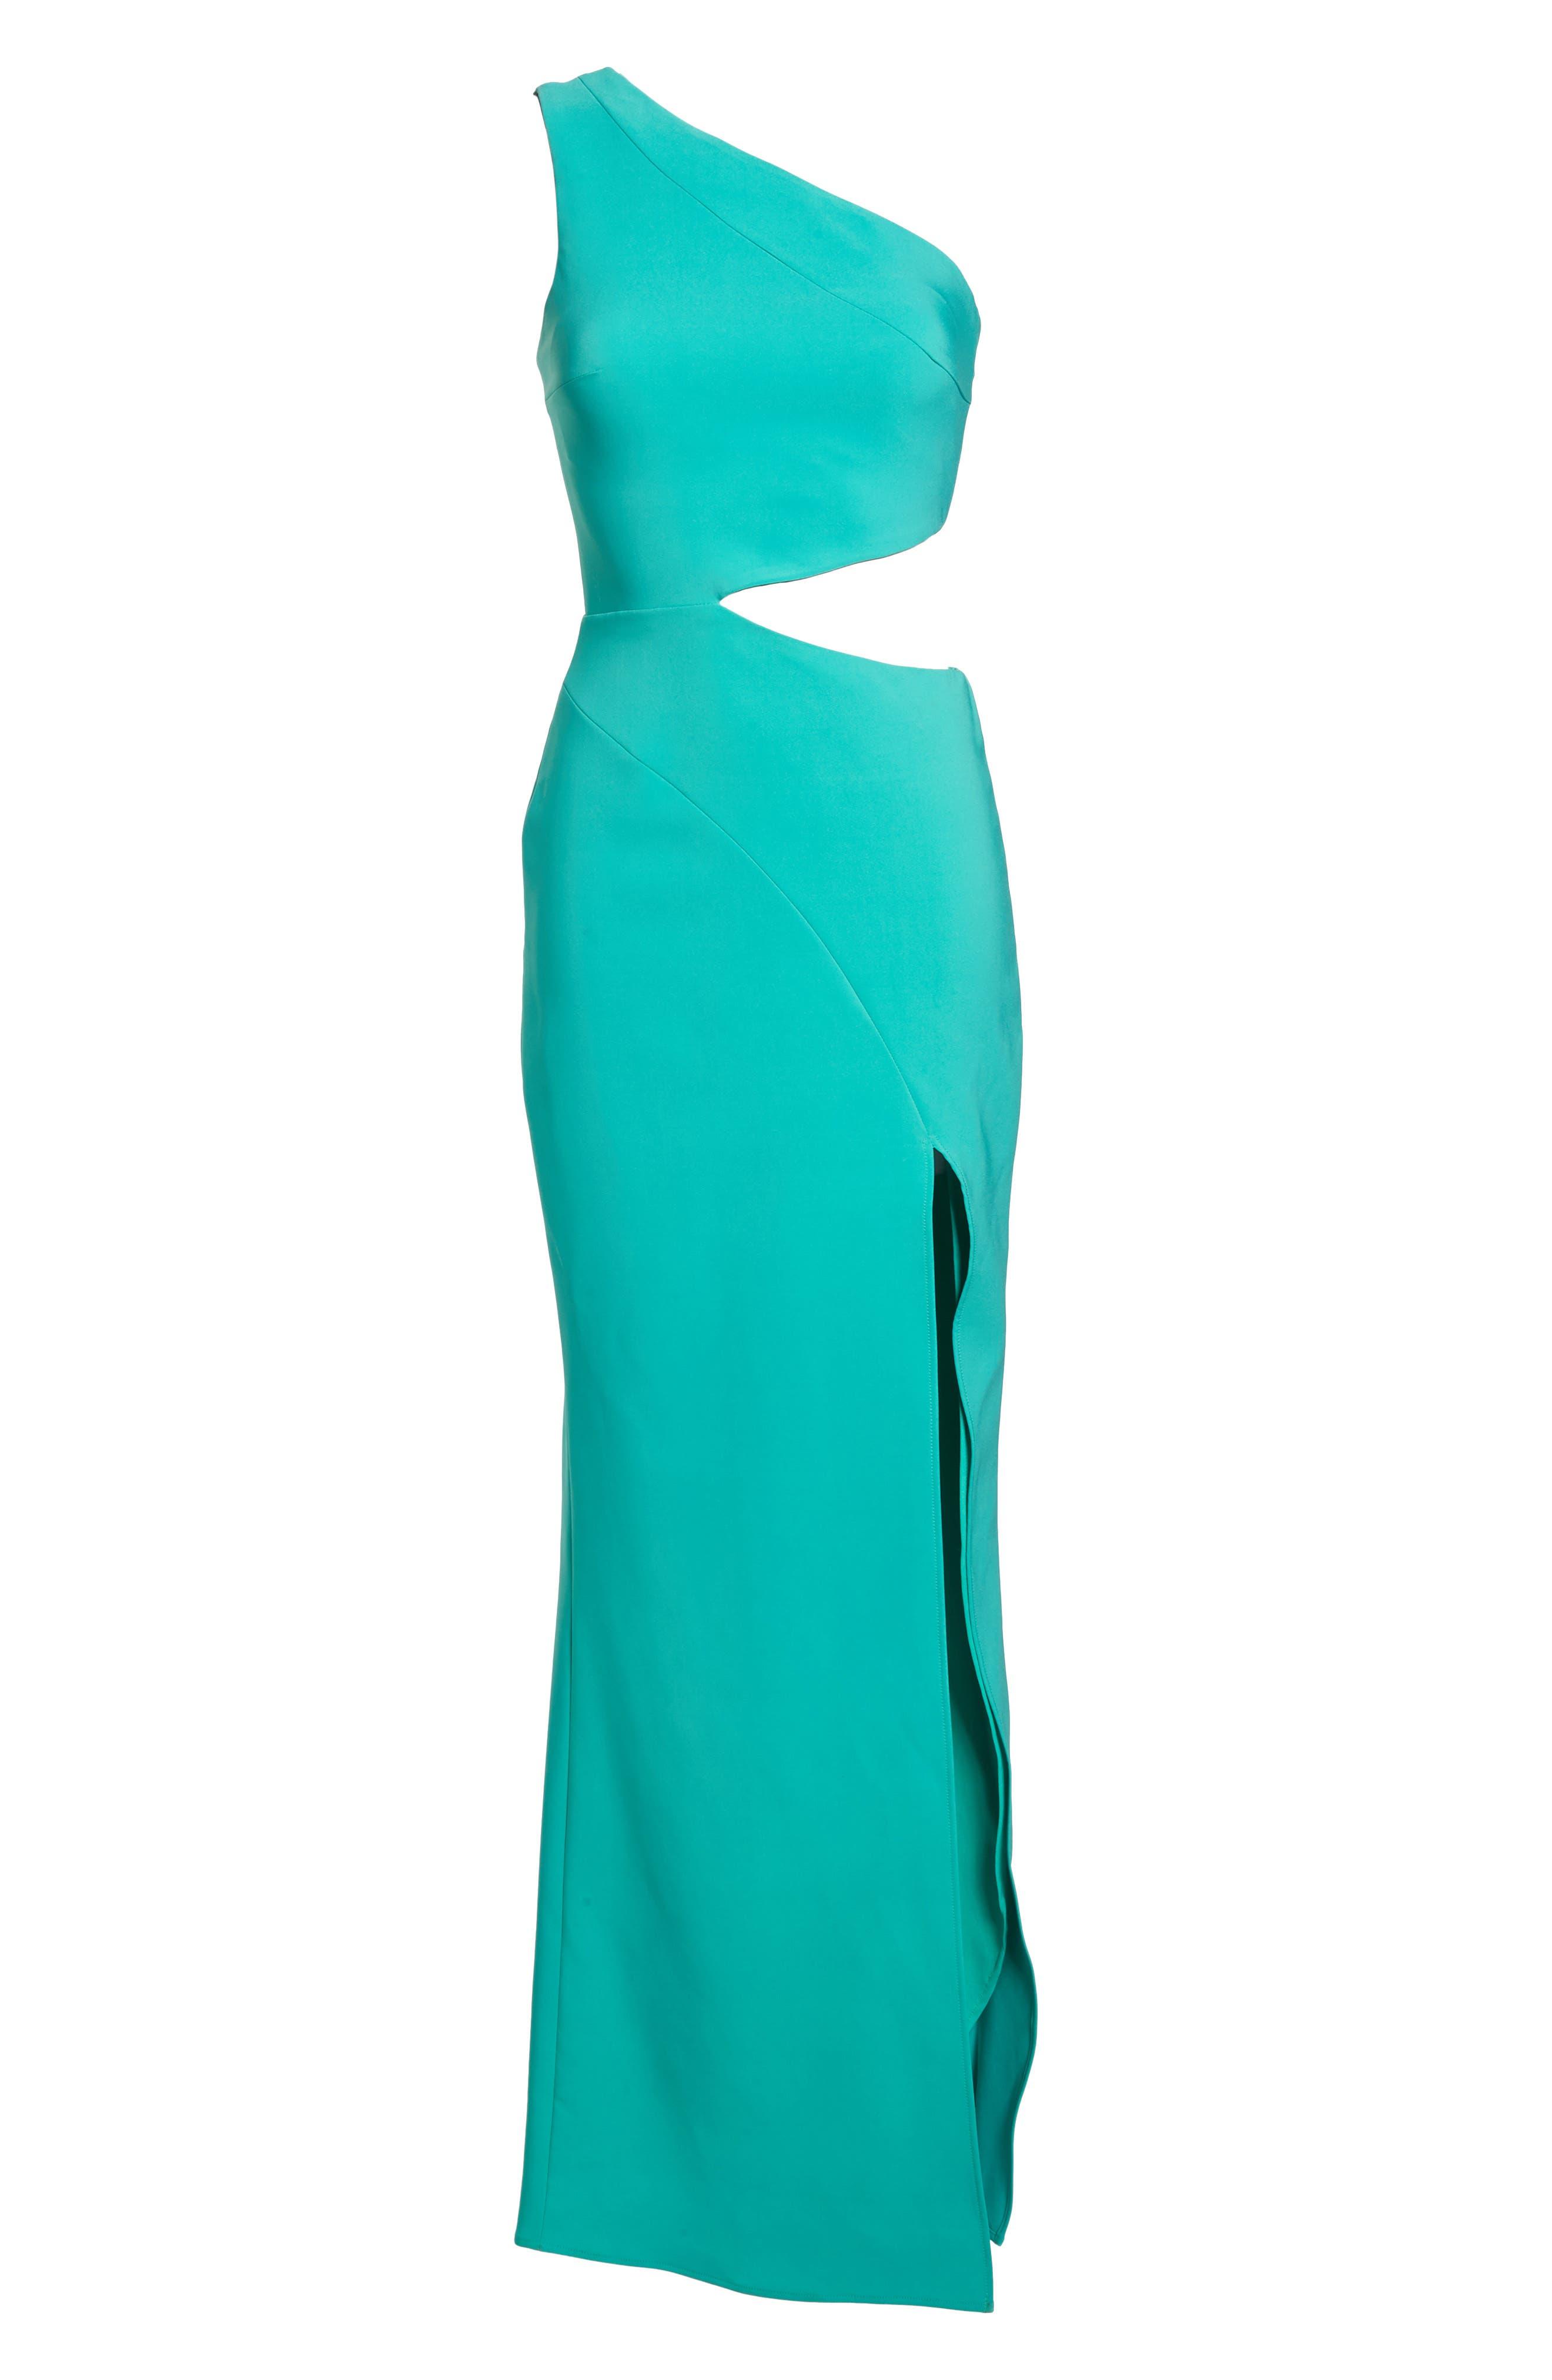 Cameron One-Shoulder Cutout Gown,                             Alternate thumbnail 7, color,                             384